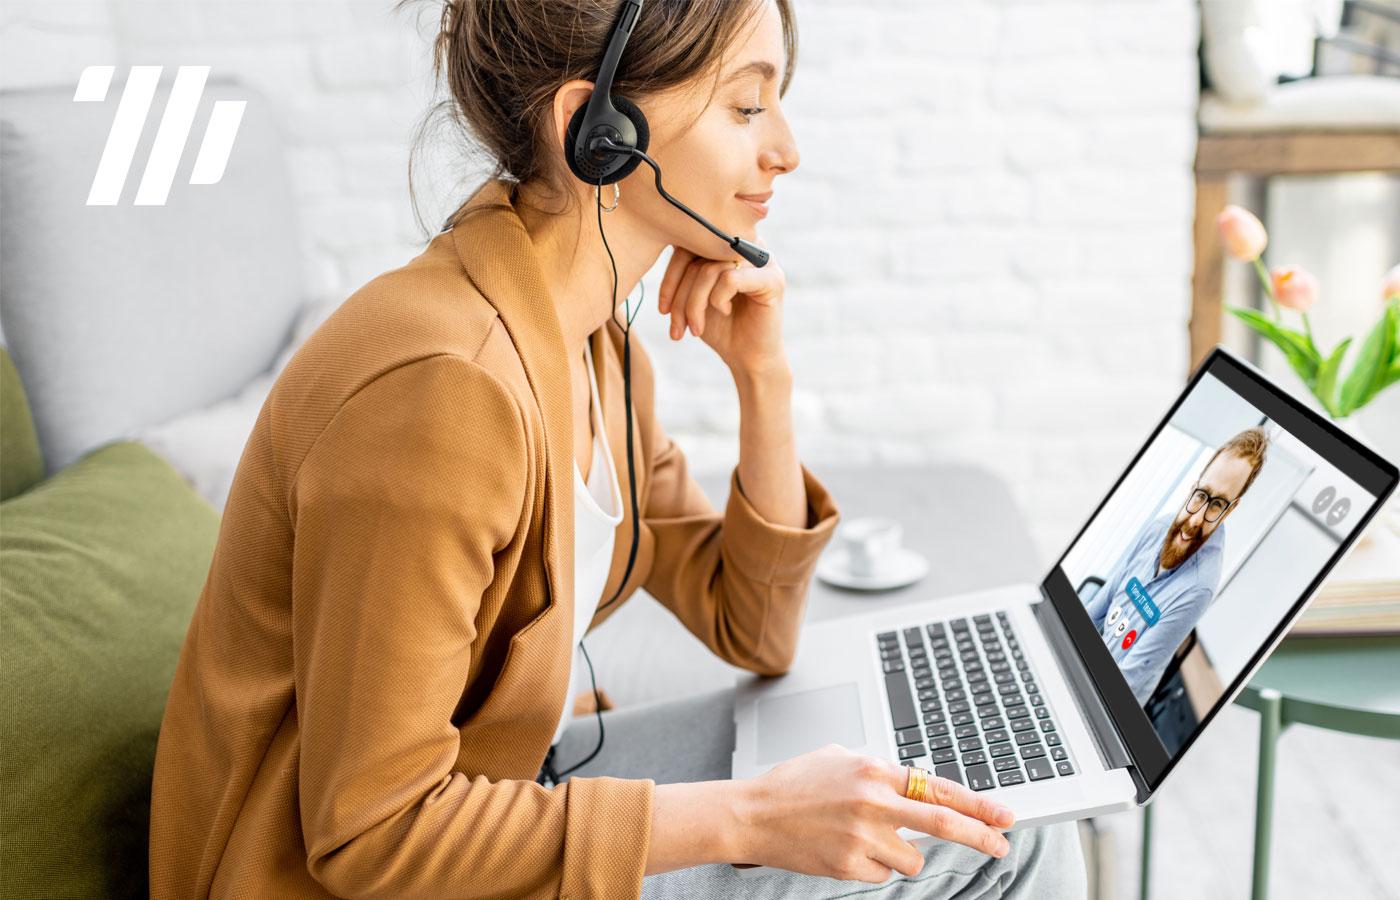 https://info.datacom.global/webinar-teletrabajo-efectivo-seguro